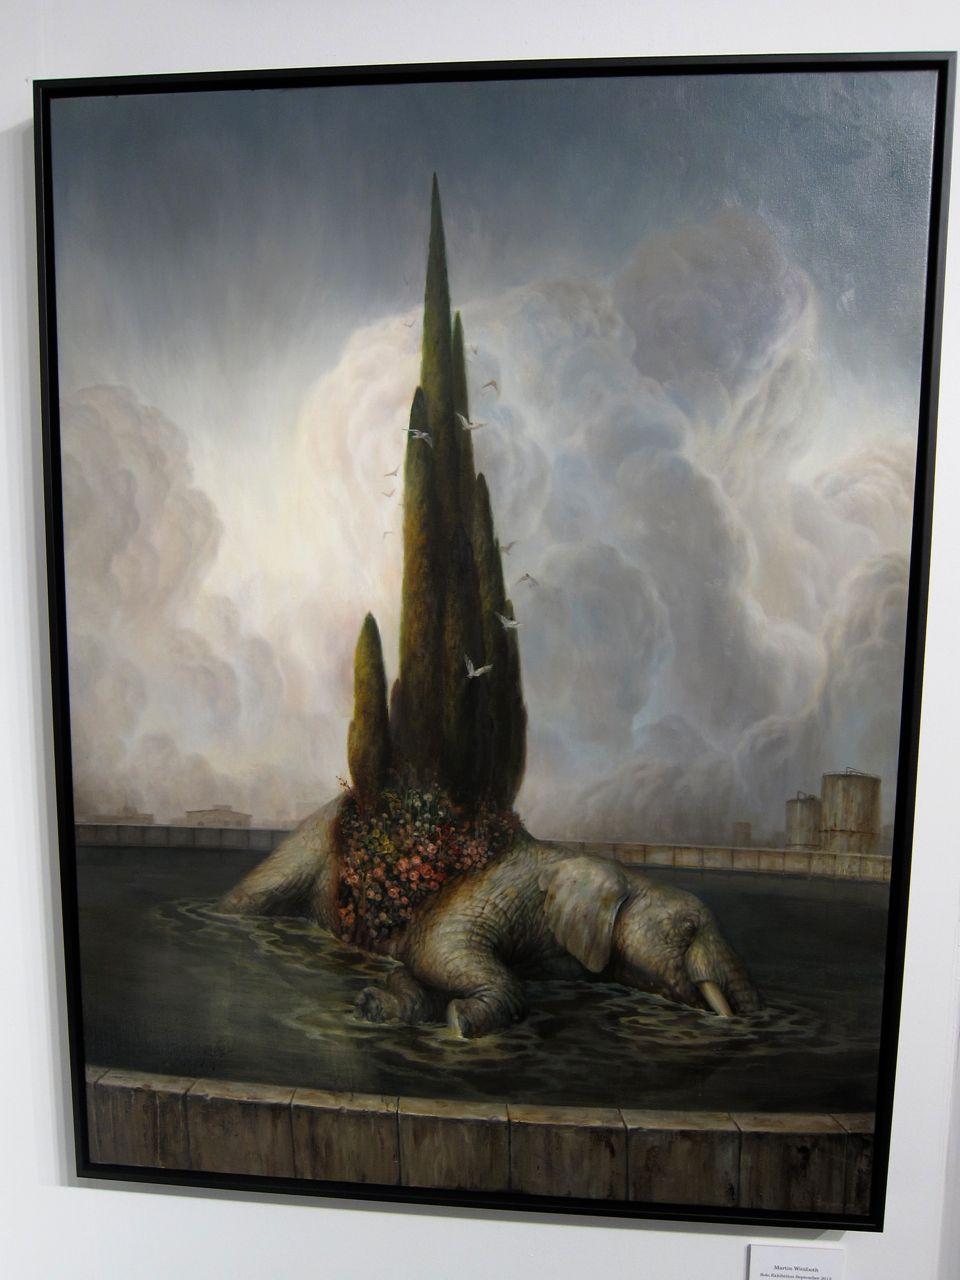 Scope Miami Corey Helford Gallery AM 17